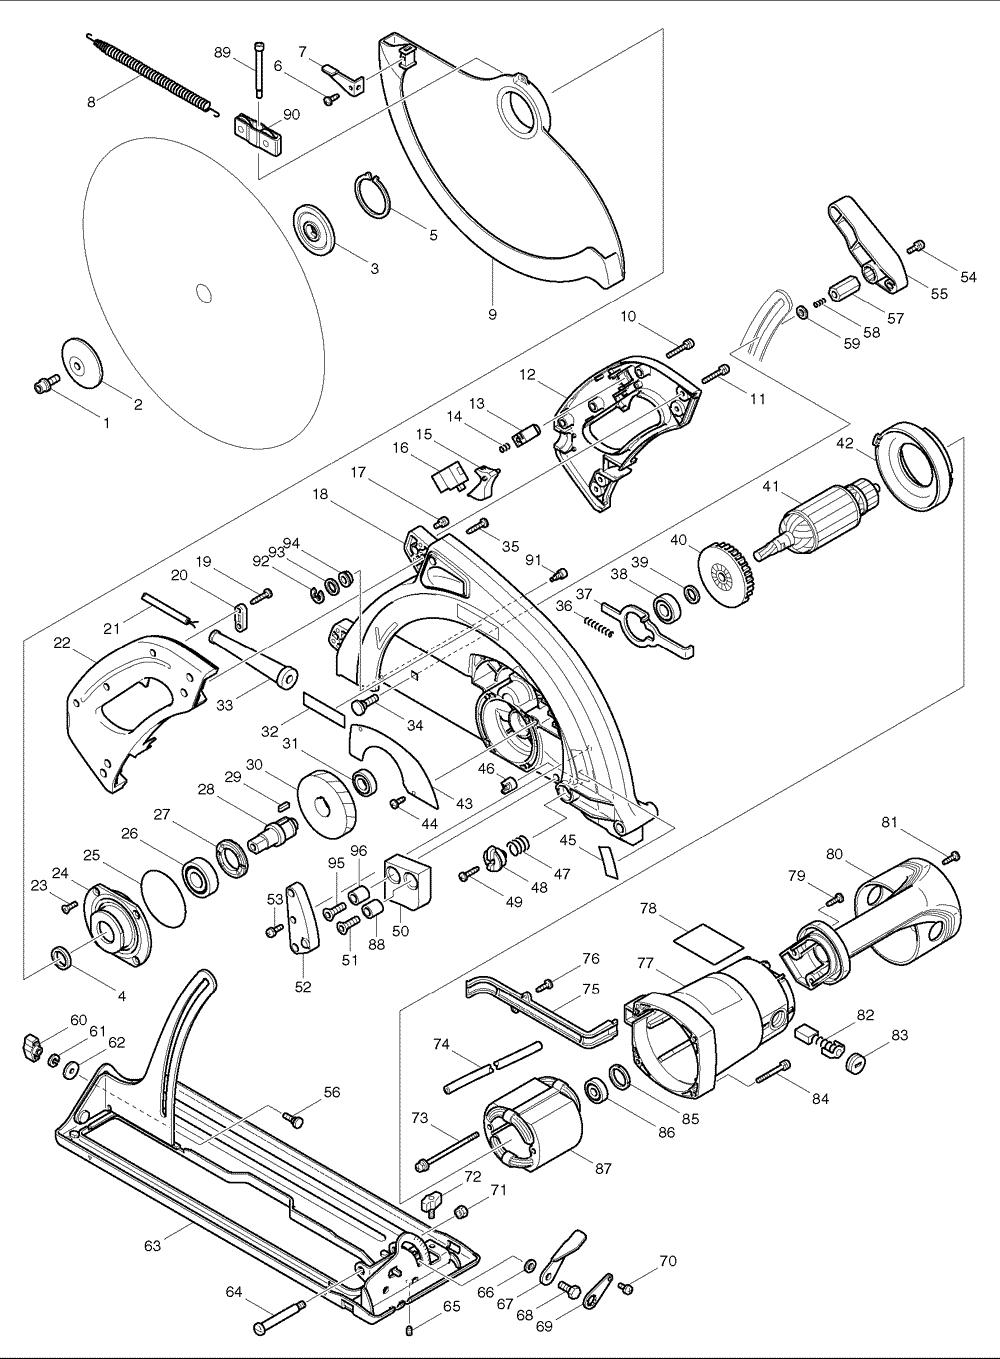 Dremel Saw Max Diagram - Schema Wiring Diagram on